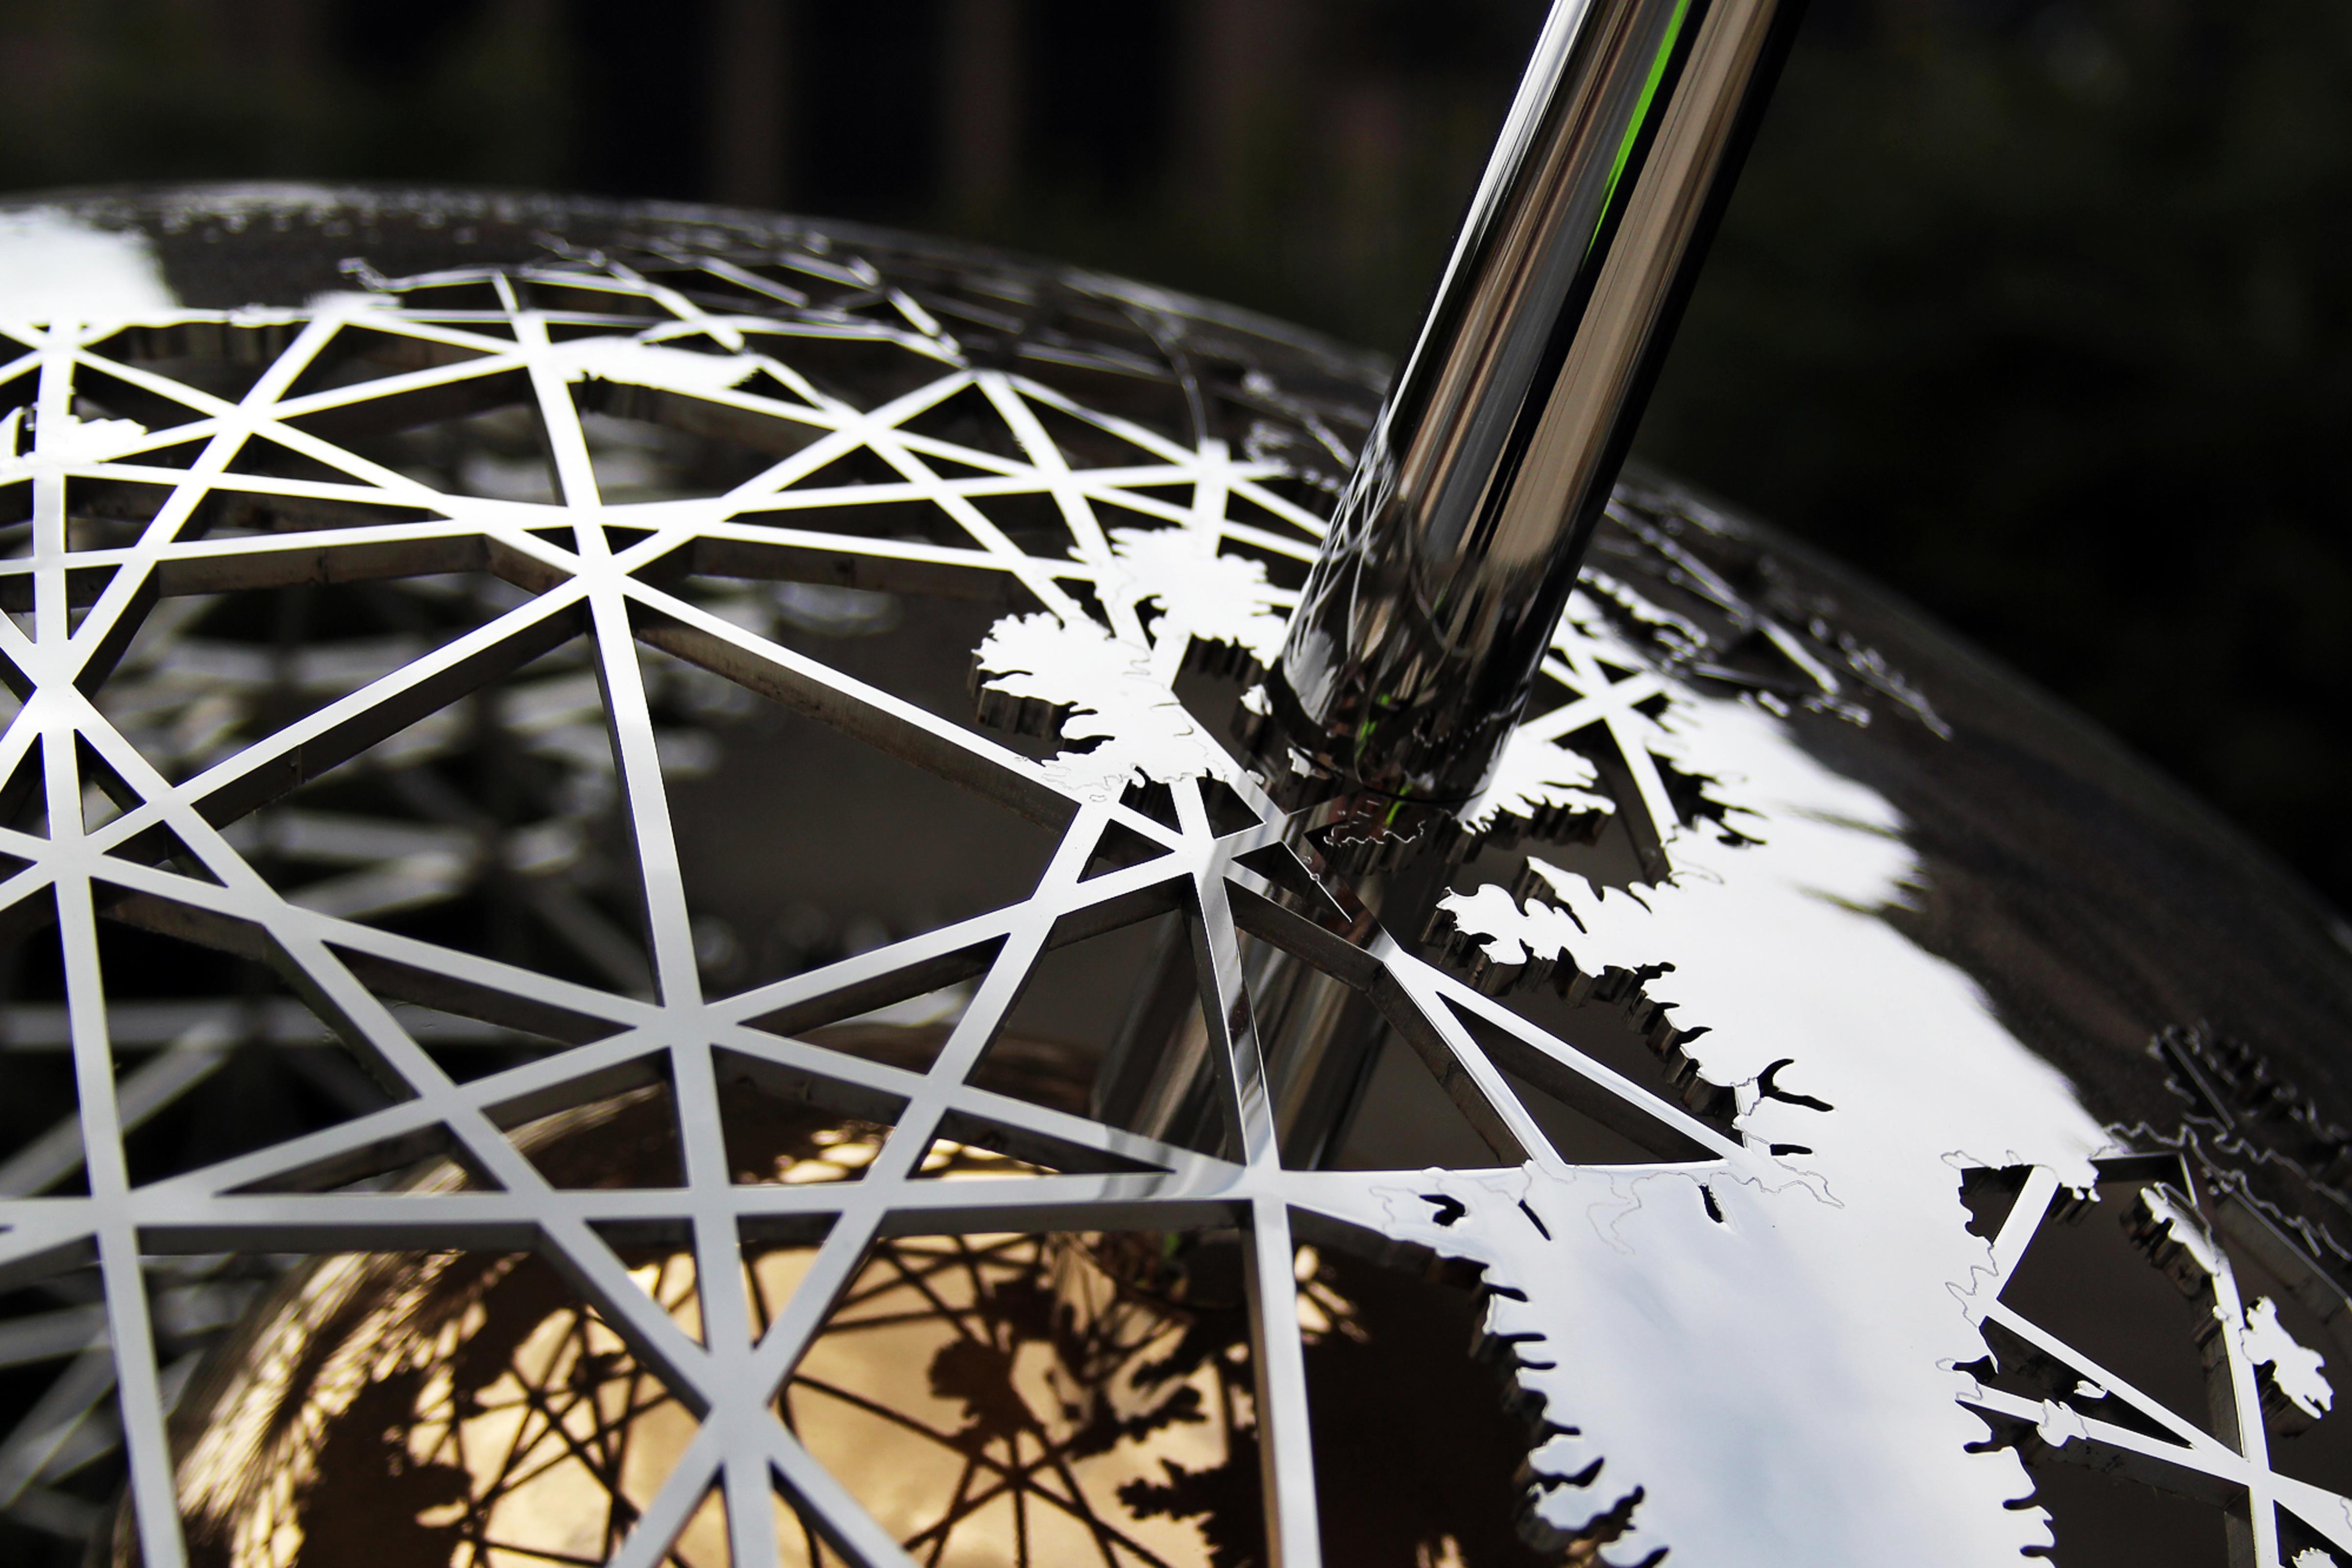 Terrestrial Sphere 2 – Copyright BJRdesigns